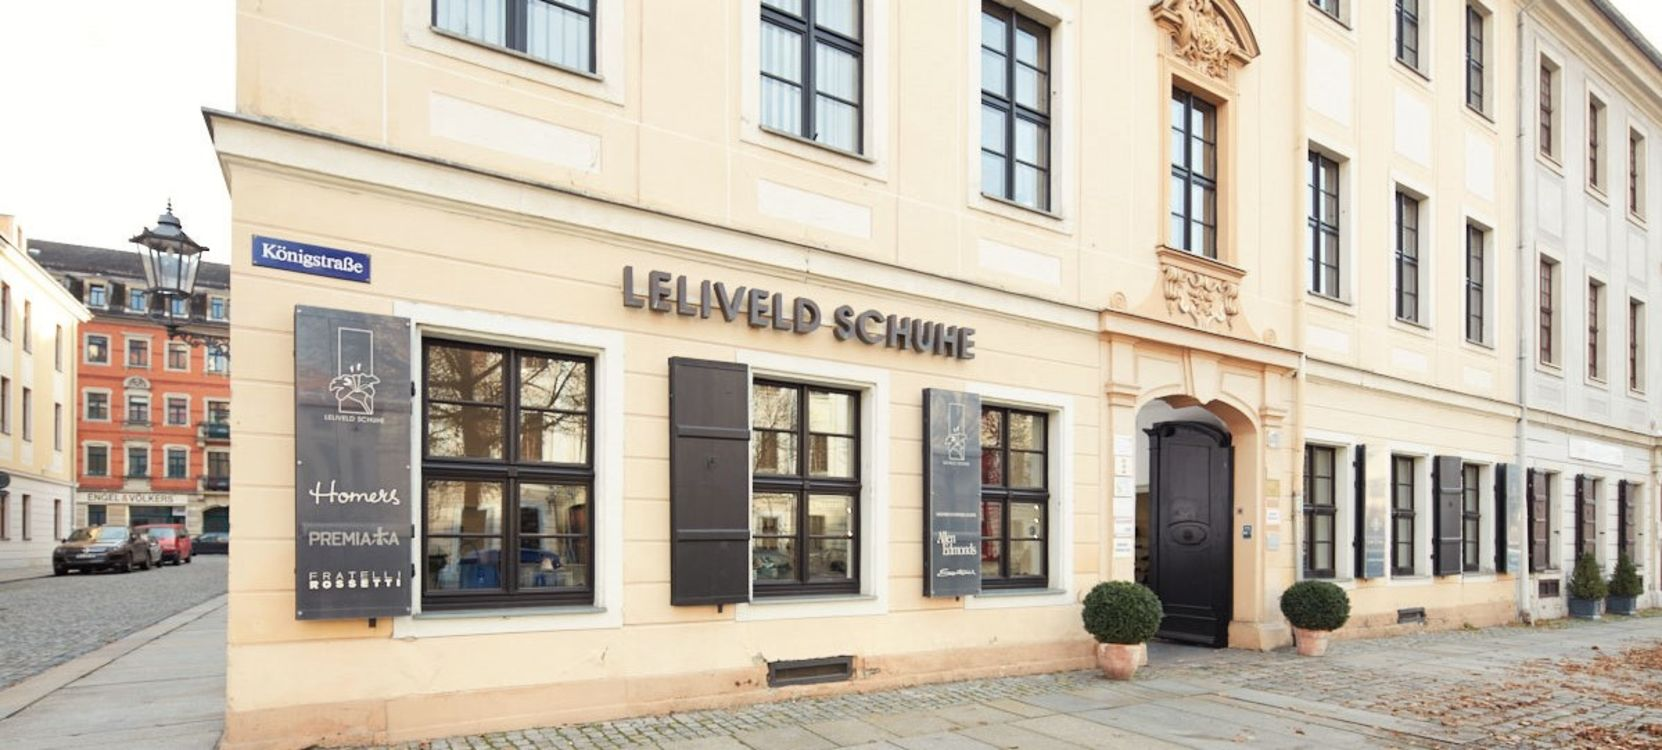 LELIVELD SCHUHE in Dresden (Bild 1)